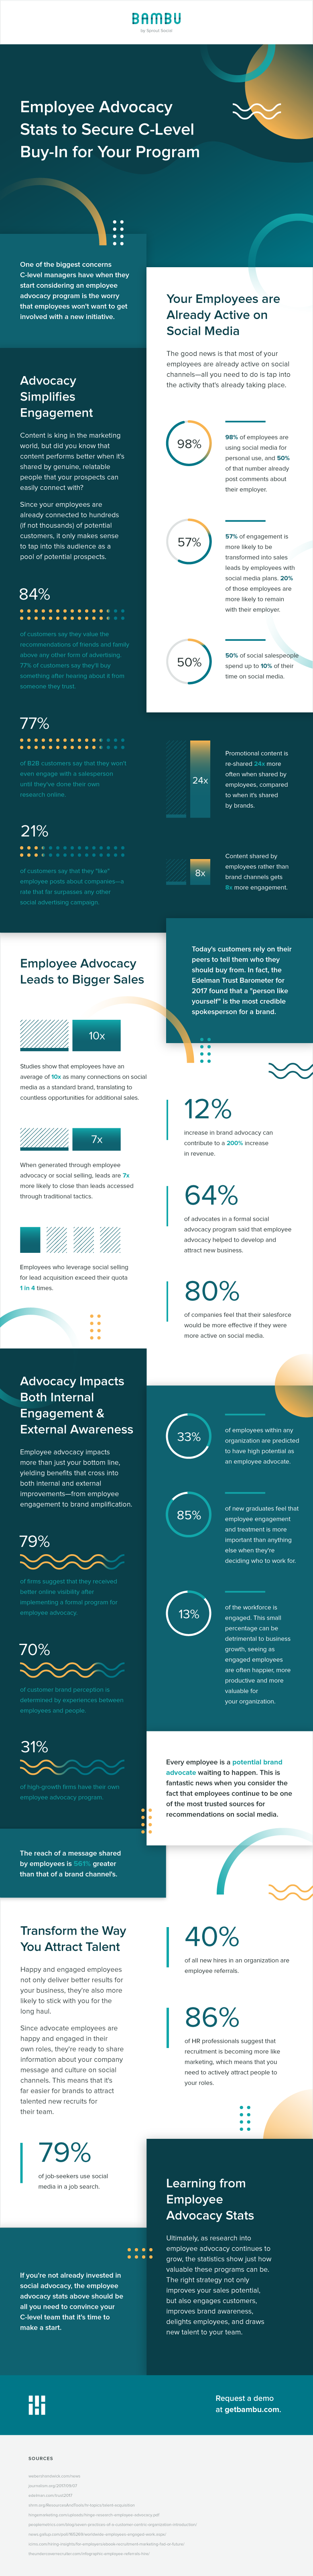 employee advocacy infographic bambu